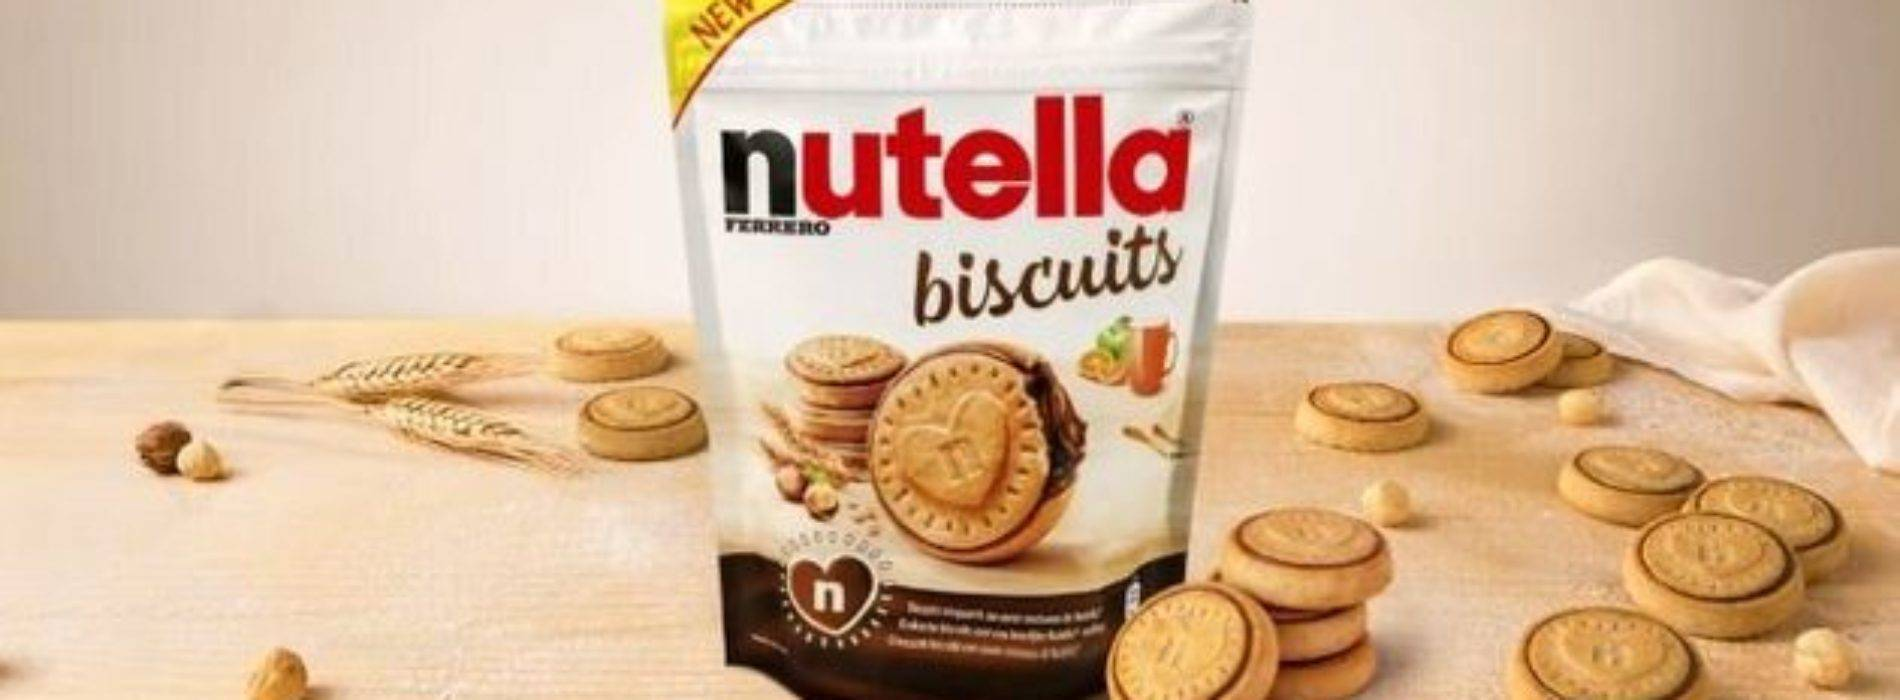 Nutella Biscuits, vendite record